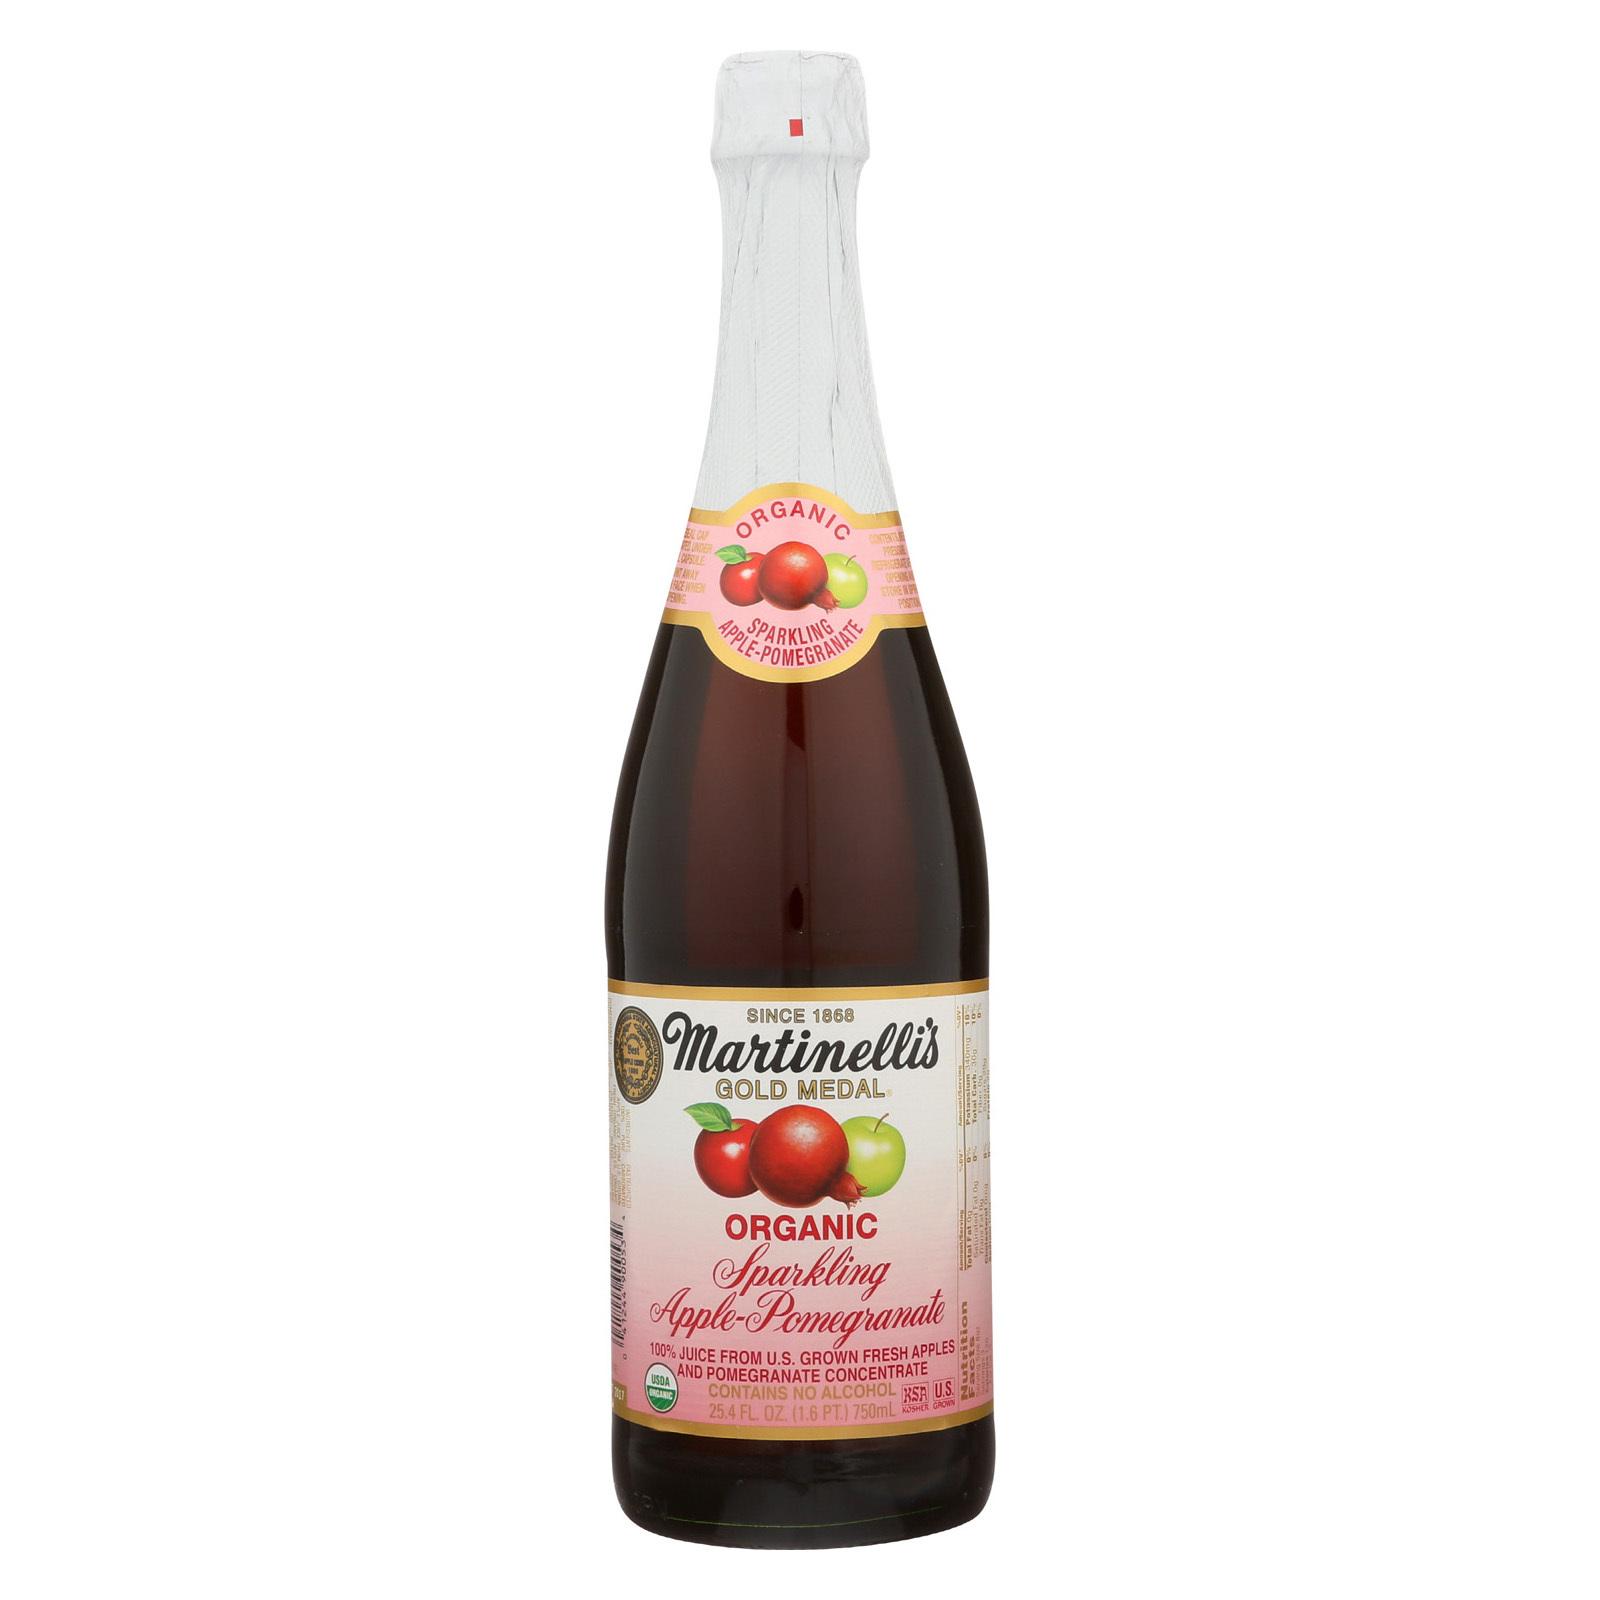 Martinelli's Sparkling Juice - Apple Pomegranate - Case of 12 - 25.4 fl oz